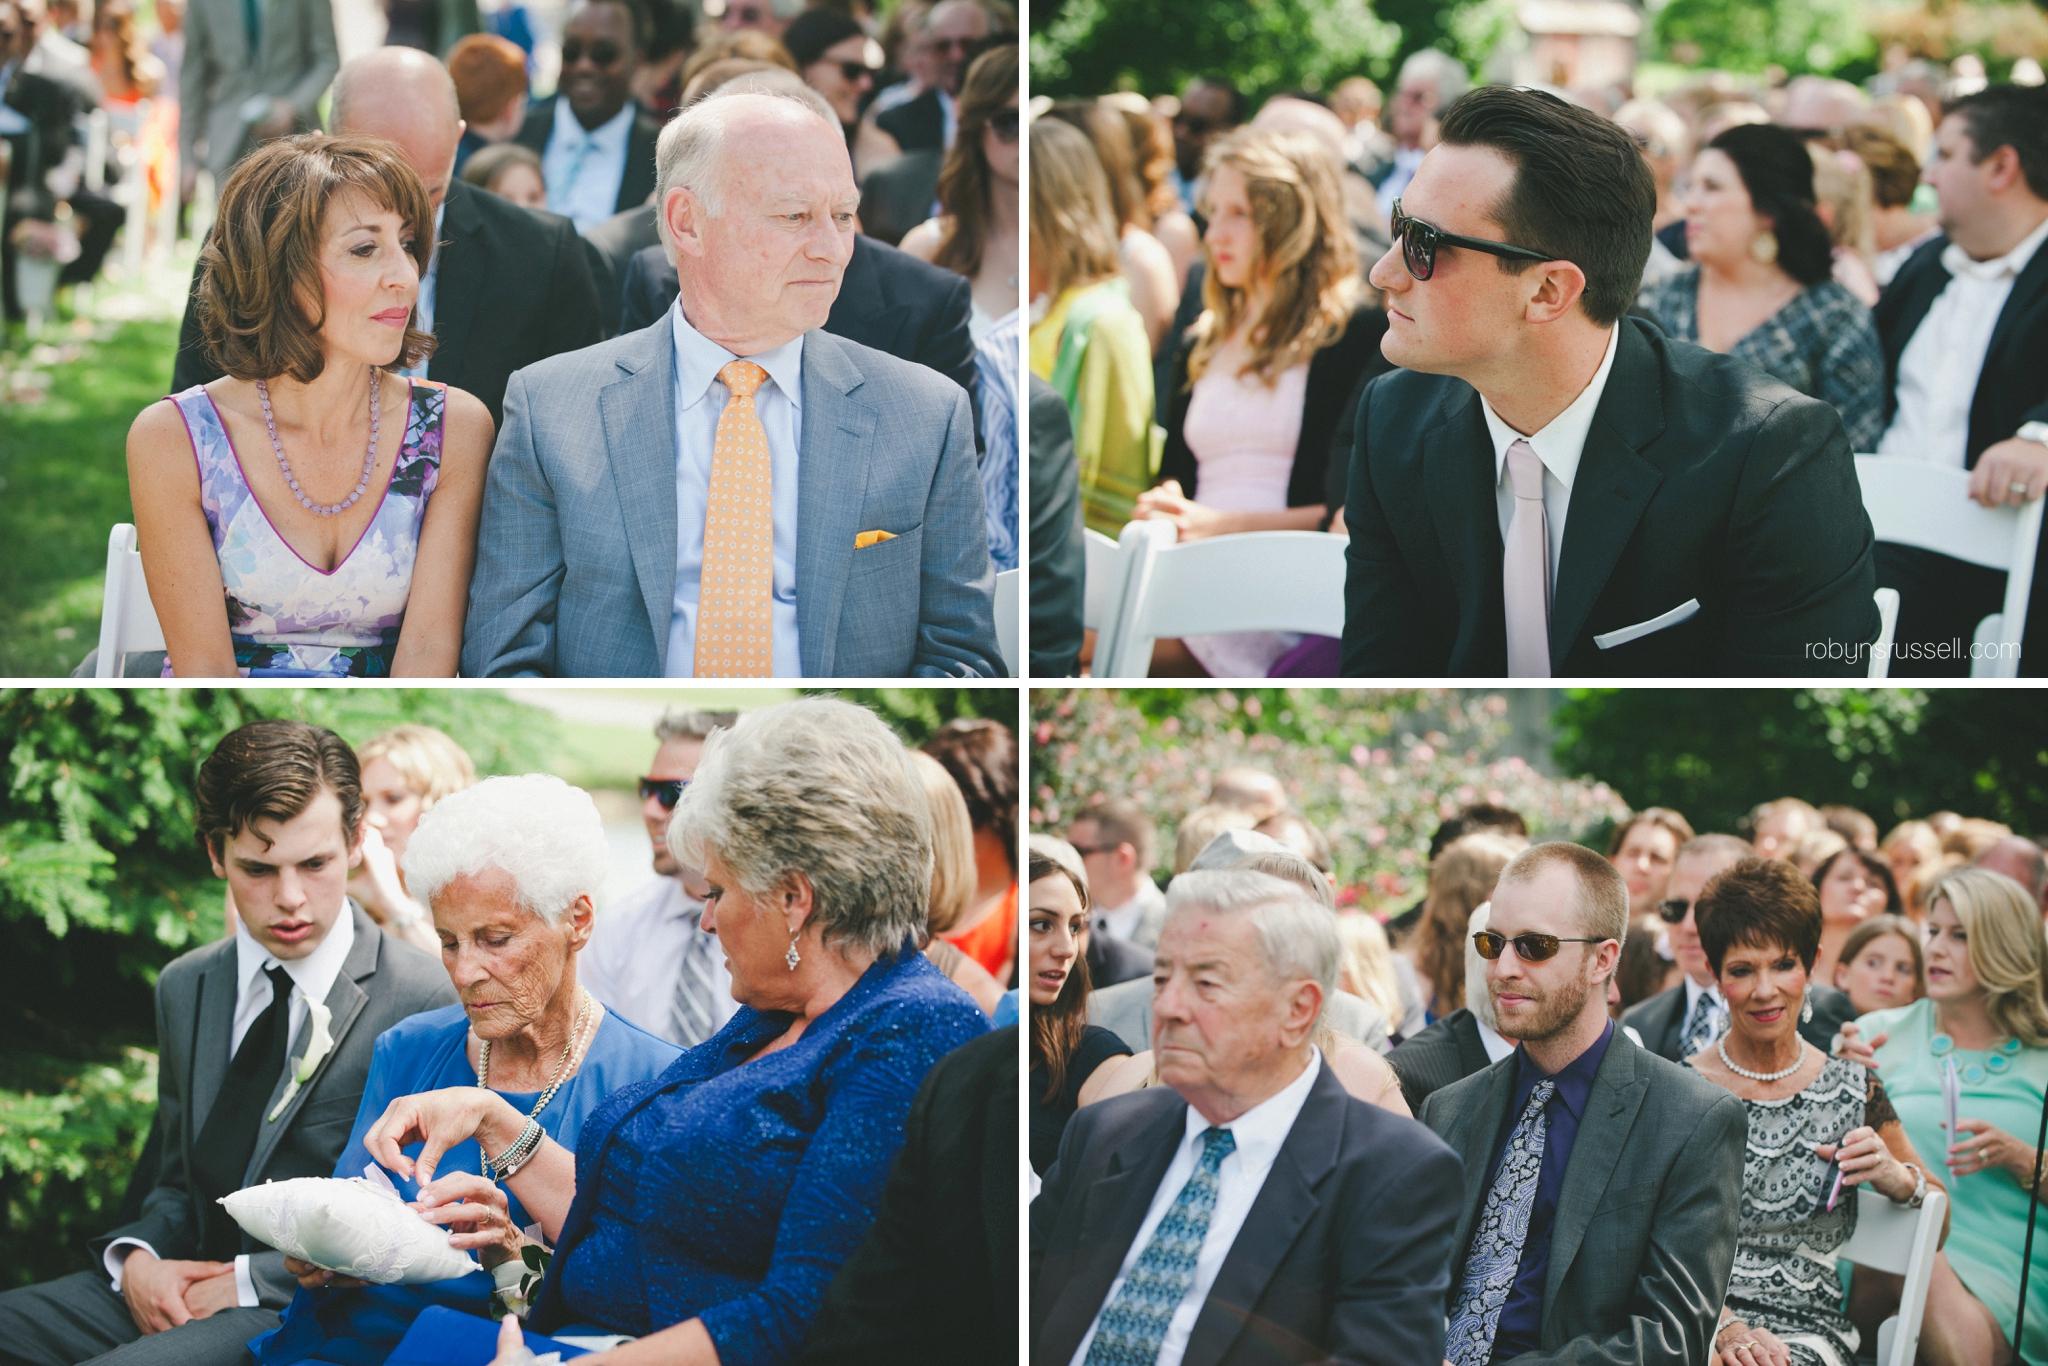 27-wedding-guests-pipers-heath-oakville.jpg